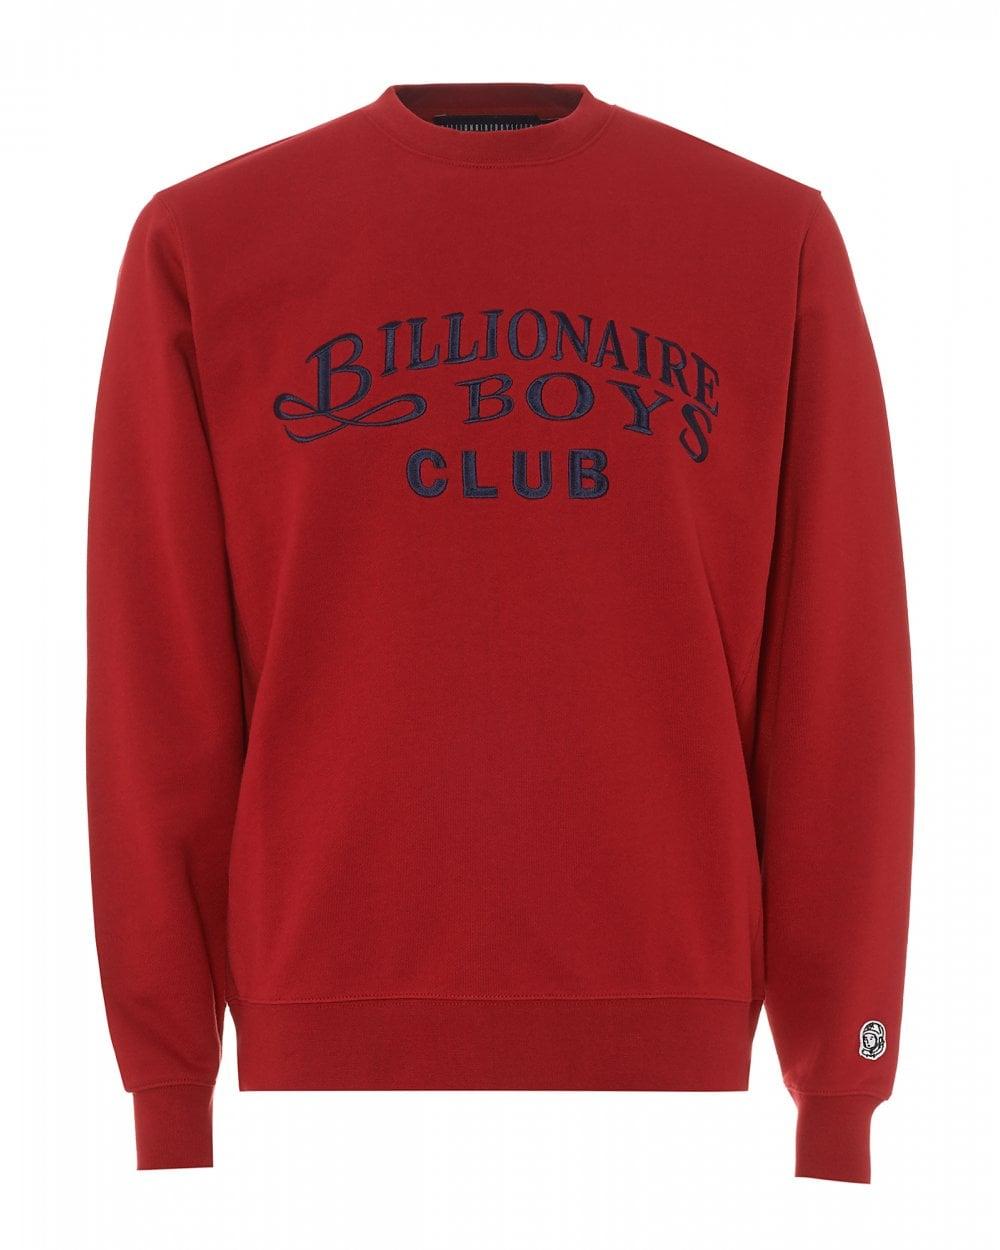 da0cb8566 Billionaire Boys Club Mens Embroidered Script Sweatshirt, Red Sweat